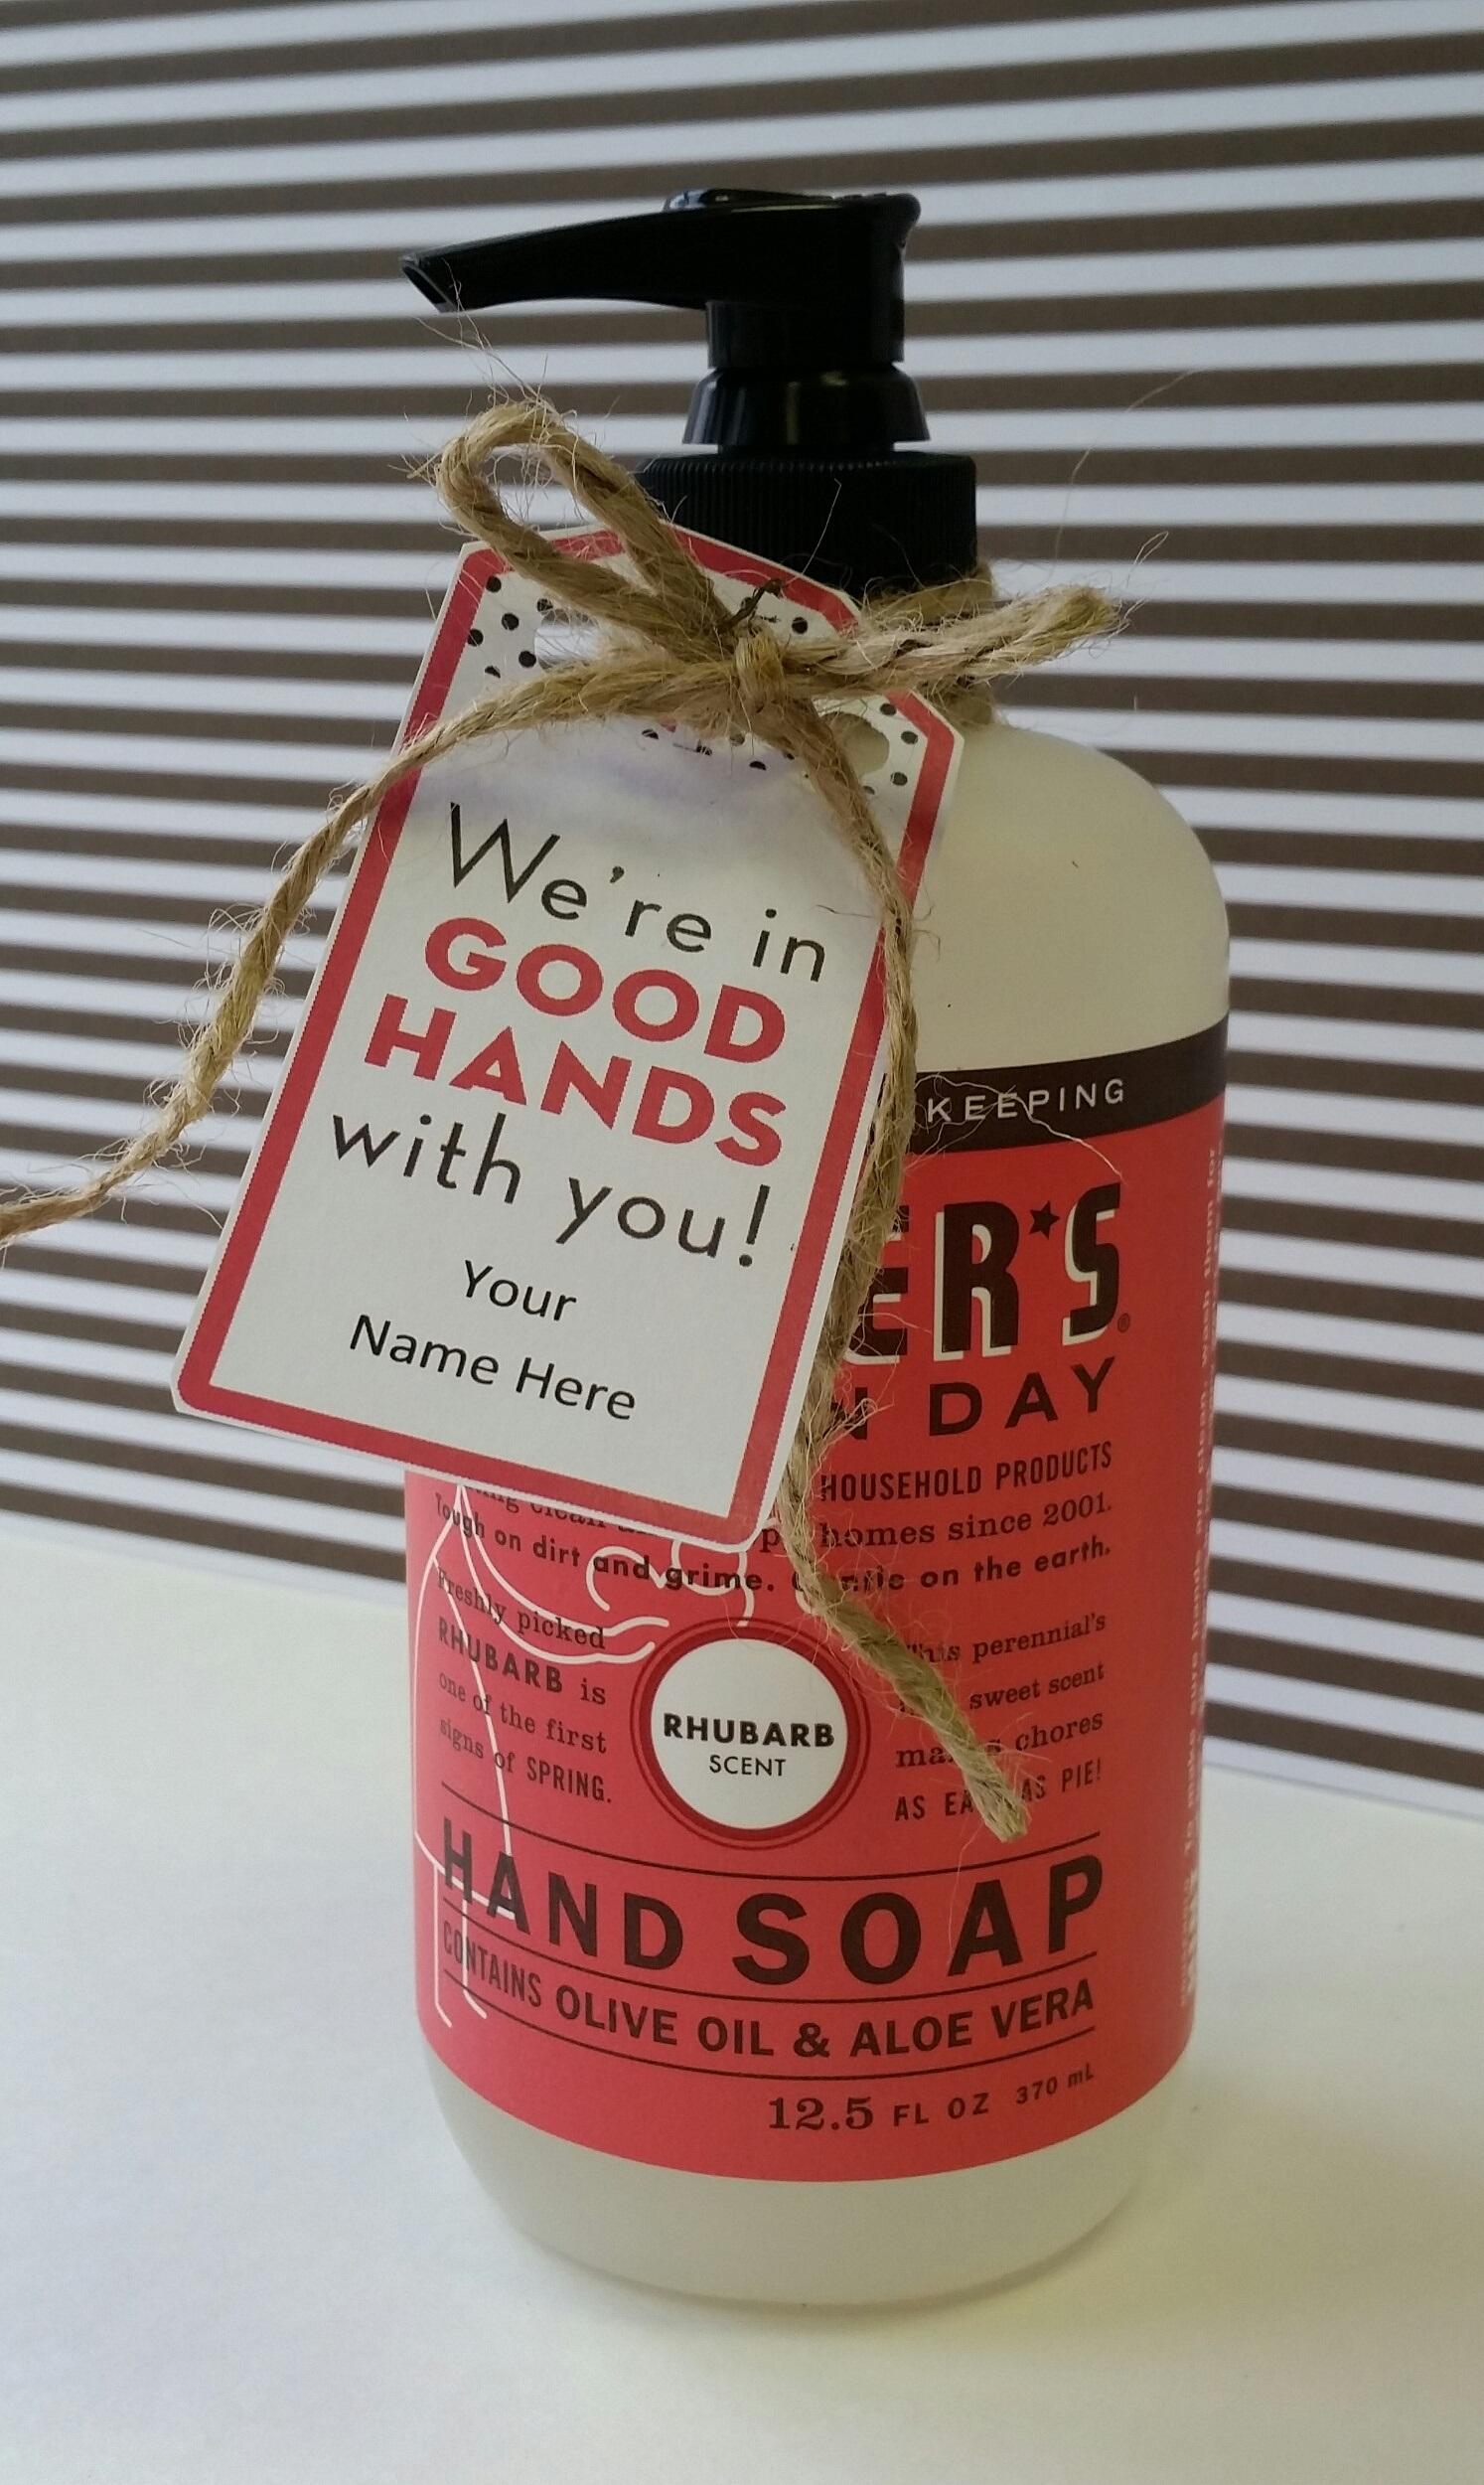 https://www.homeroommom.com/post/367-teacher-appreciation-printable-gift-tags